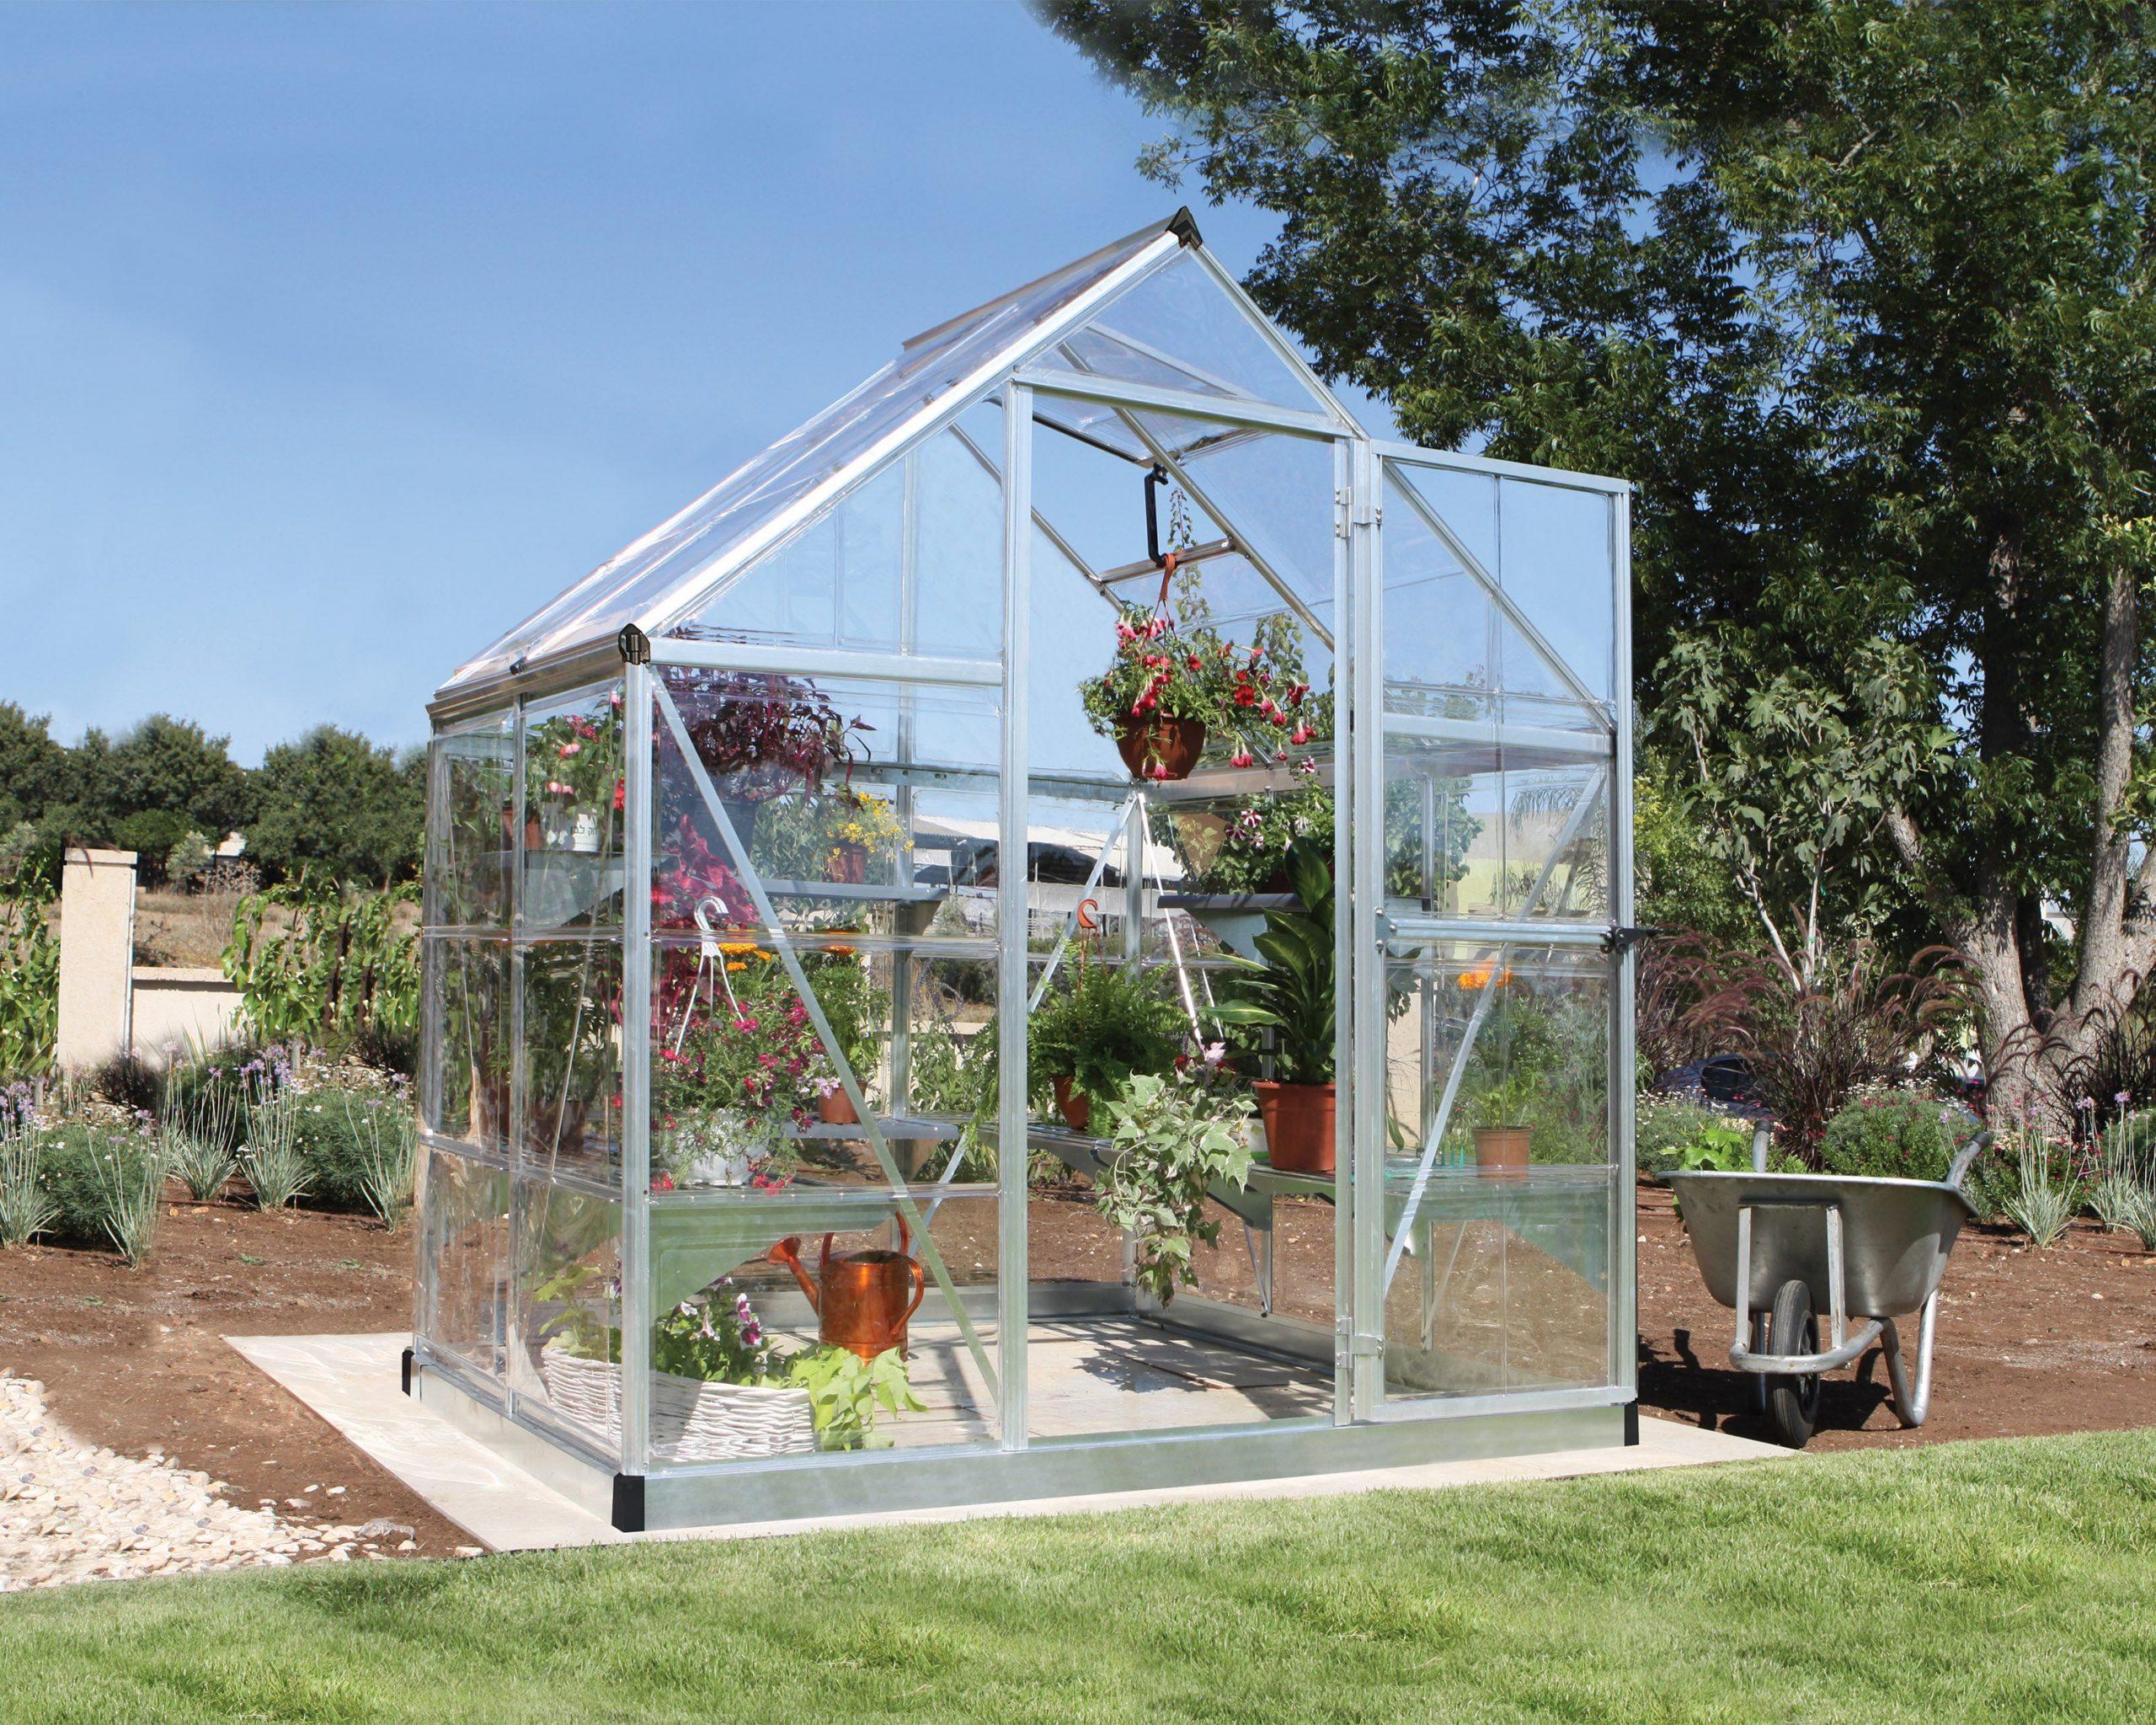 Serre De Jardin Argent Harmony 2.3 M², Aluminium Et Polycarbonate, Palram tout Serres De Jardin Leroy Merlin